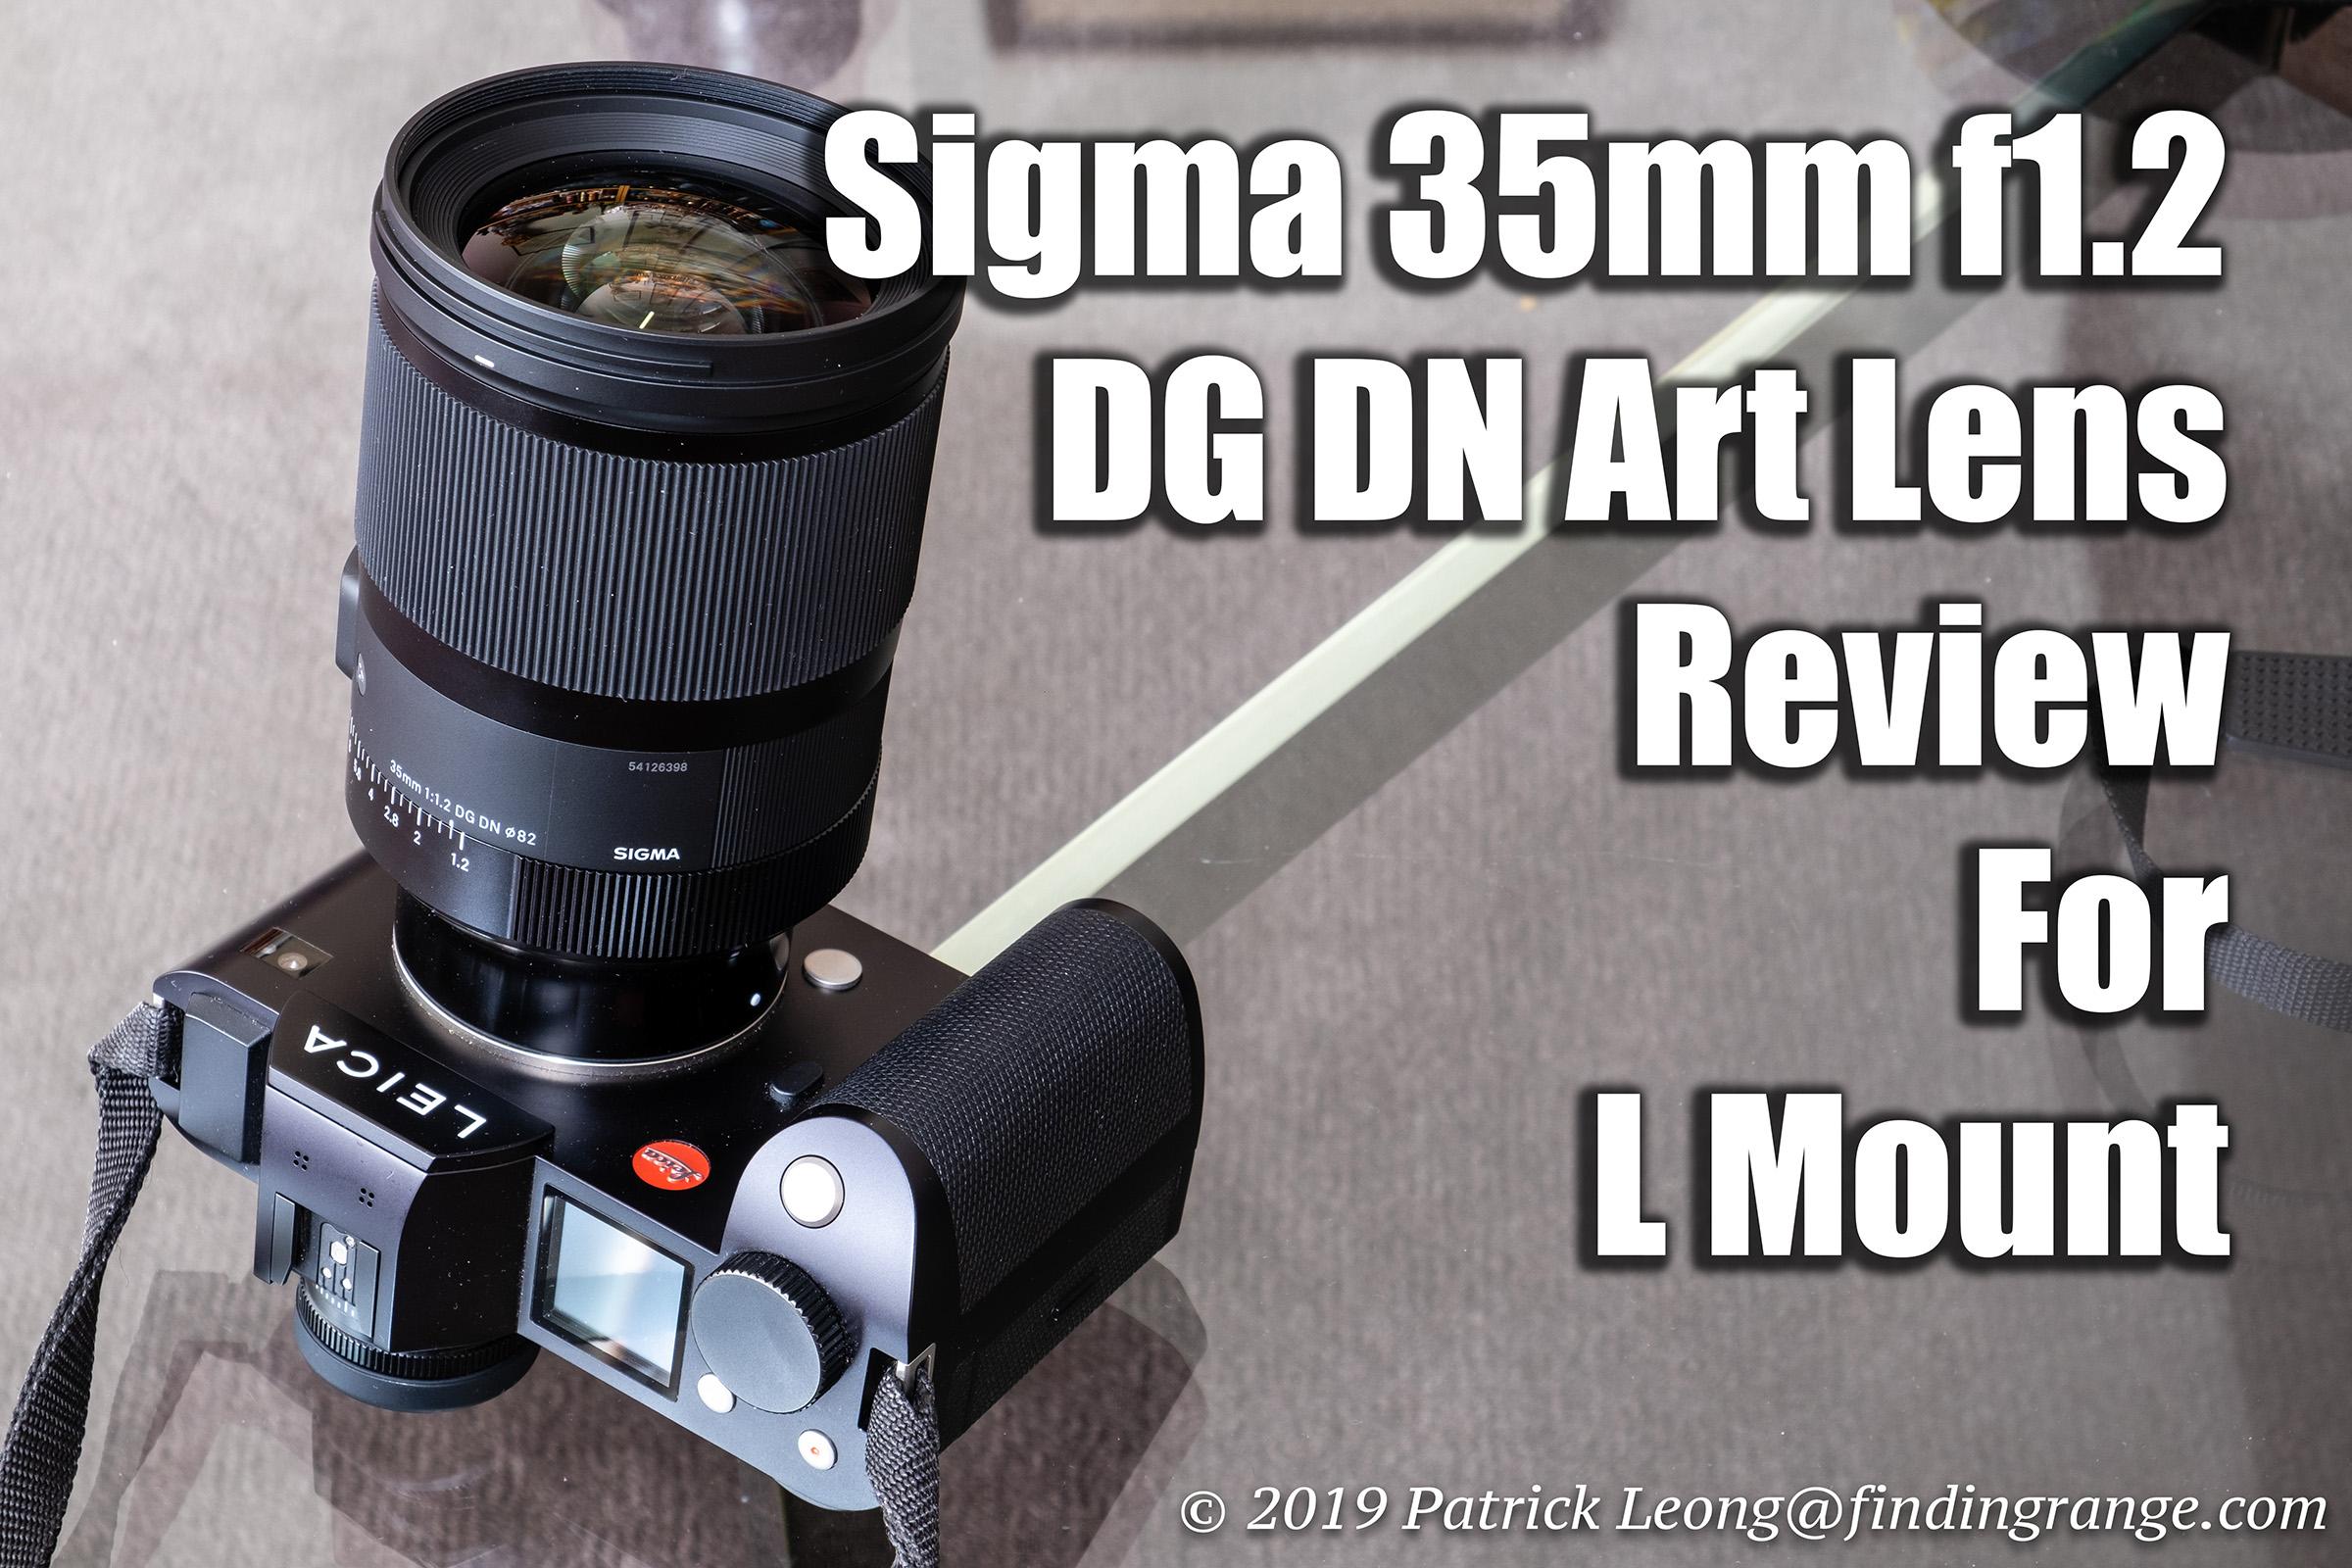 Sigma 35mm f1.2 DG DN Art Lens Review For L Mount